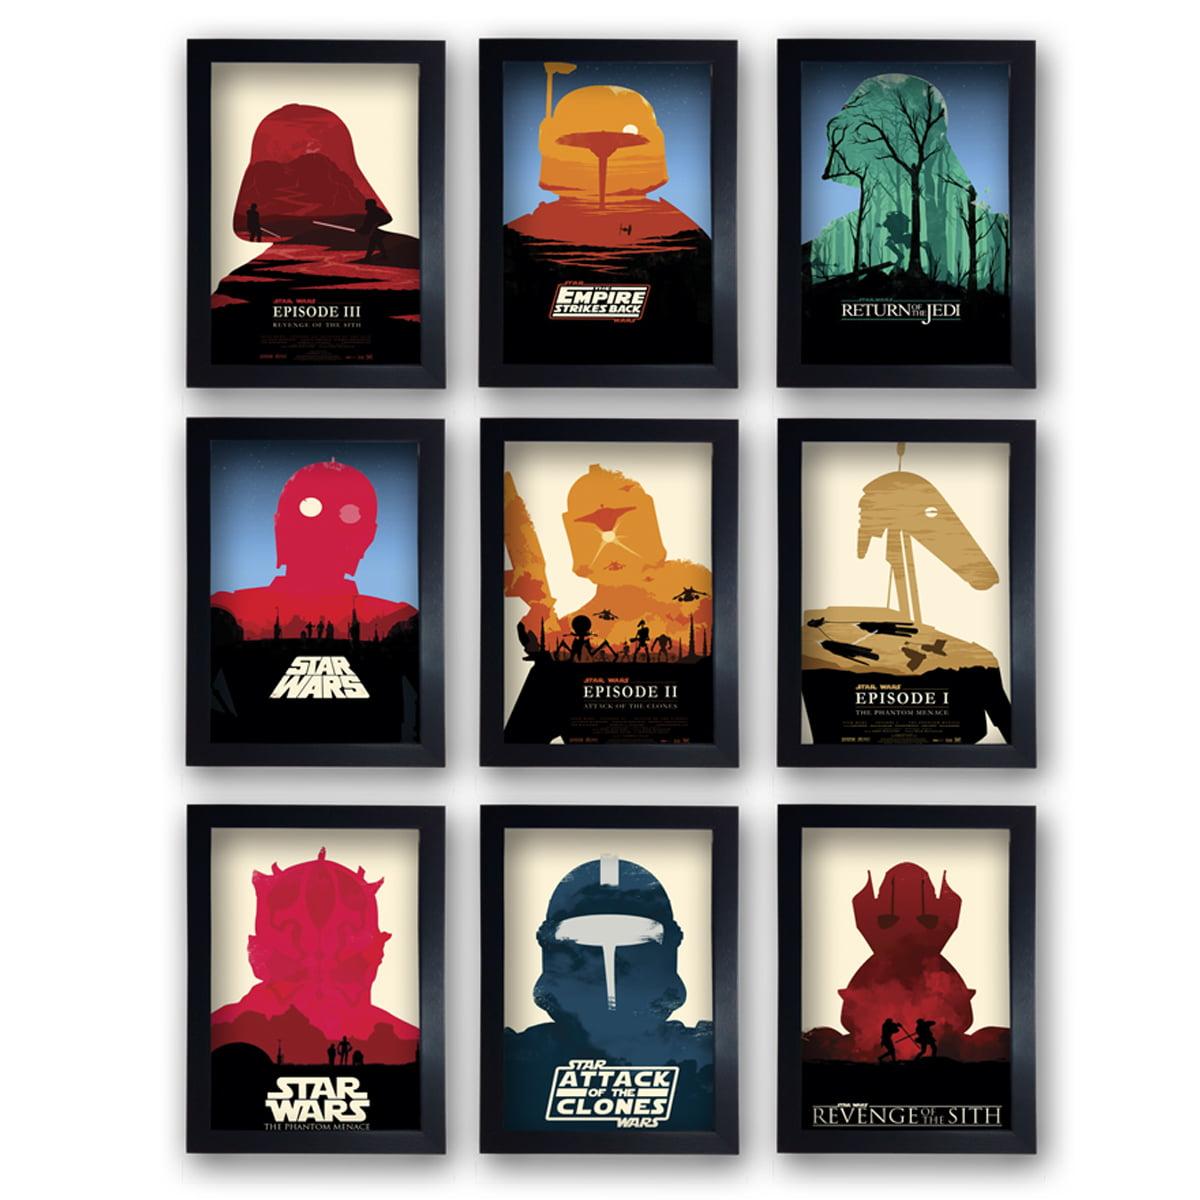 Kit 9 Quadros Star Wars Decorativo Poster Quarto Com Moldura 20x30